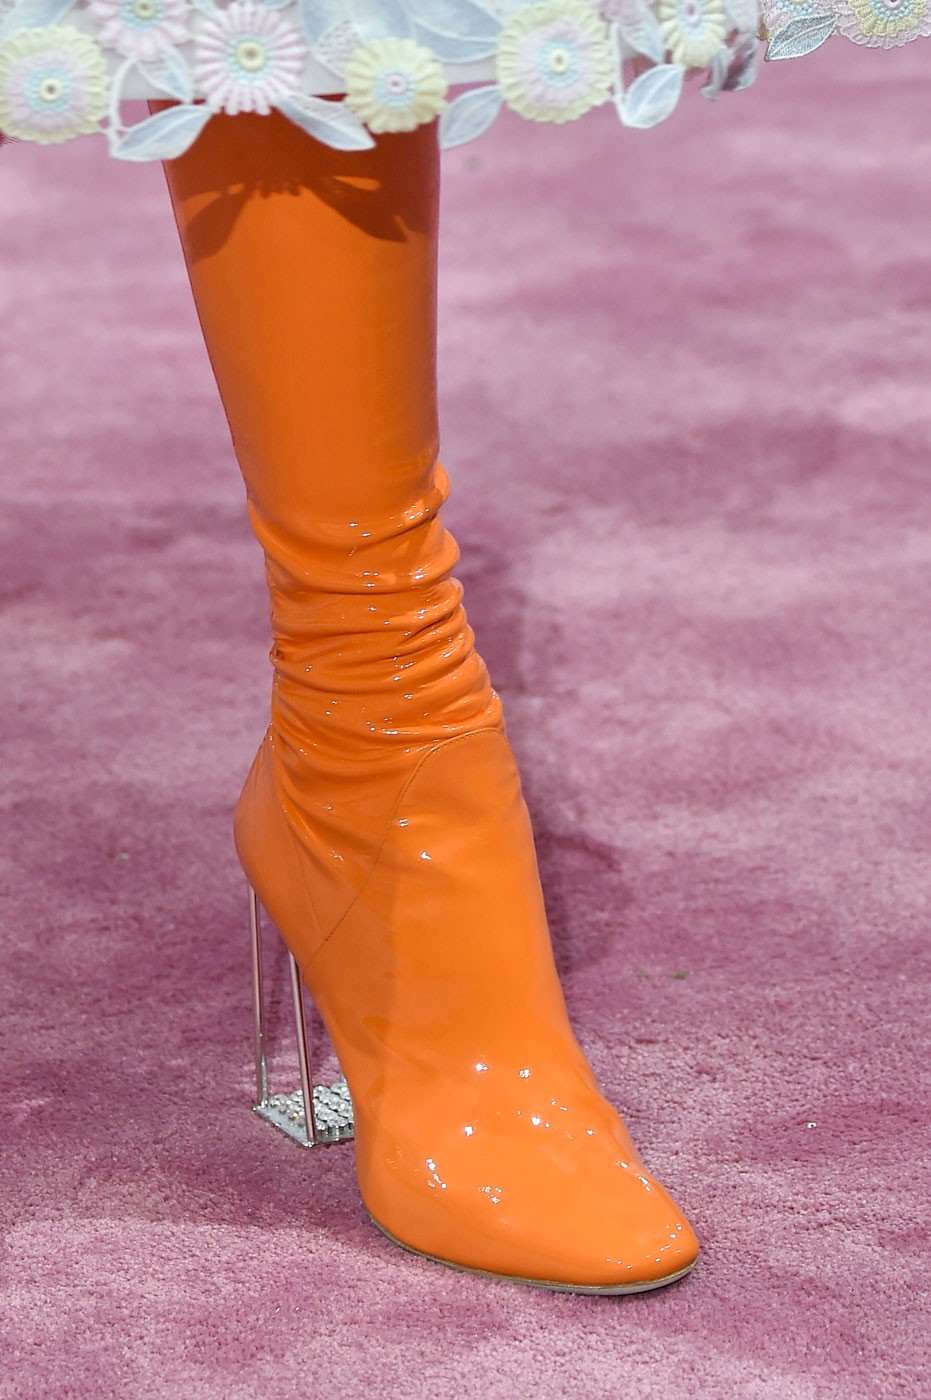 Christian-Dior-fashion-runway-show-close-ups-haute-couture-paris-spring-summer-2015-the-impression-056